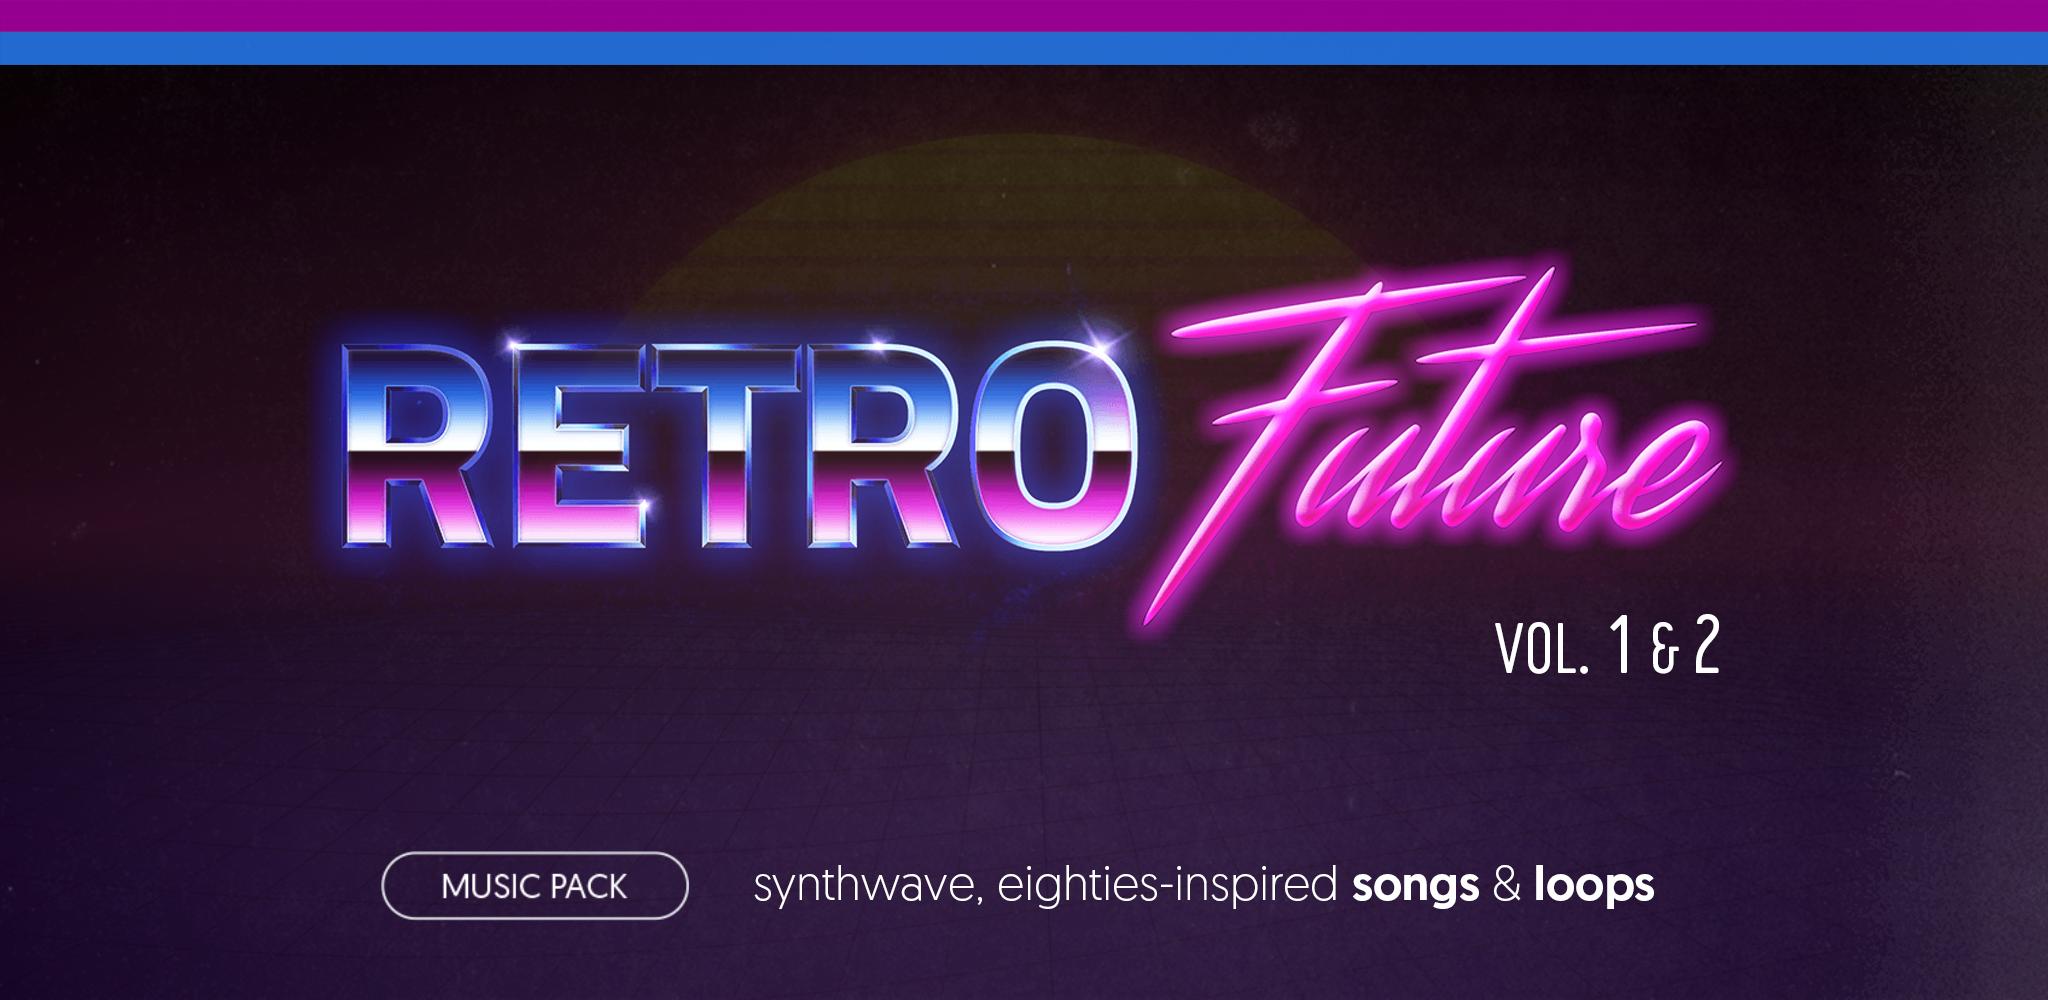 Retro Future Complete (vol. 1 & 2) - music pack